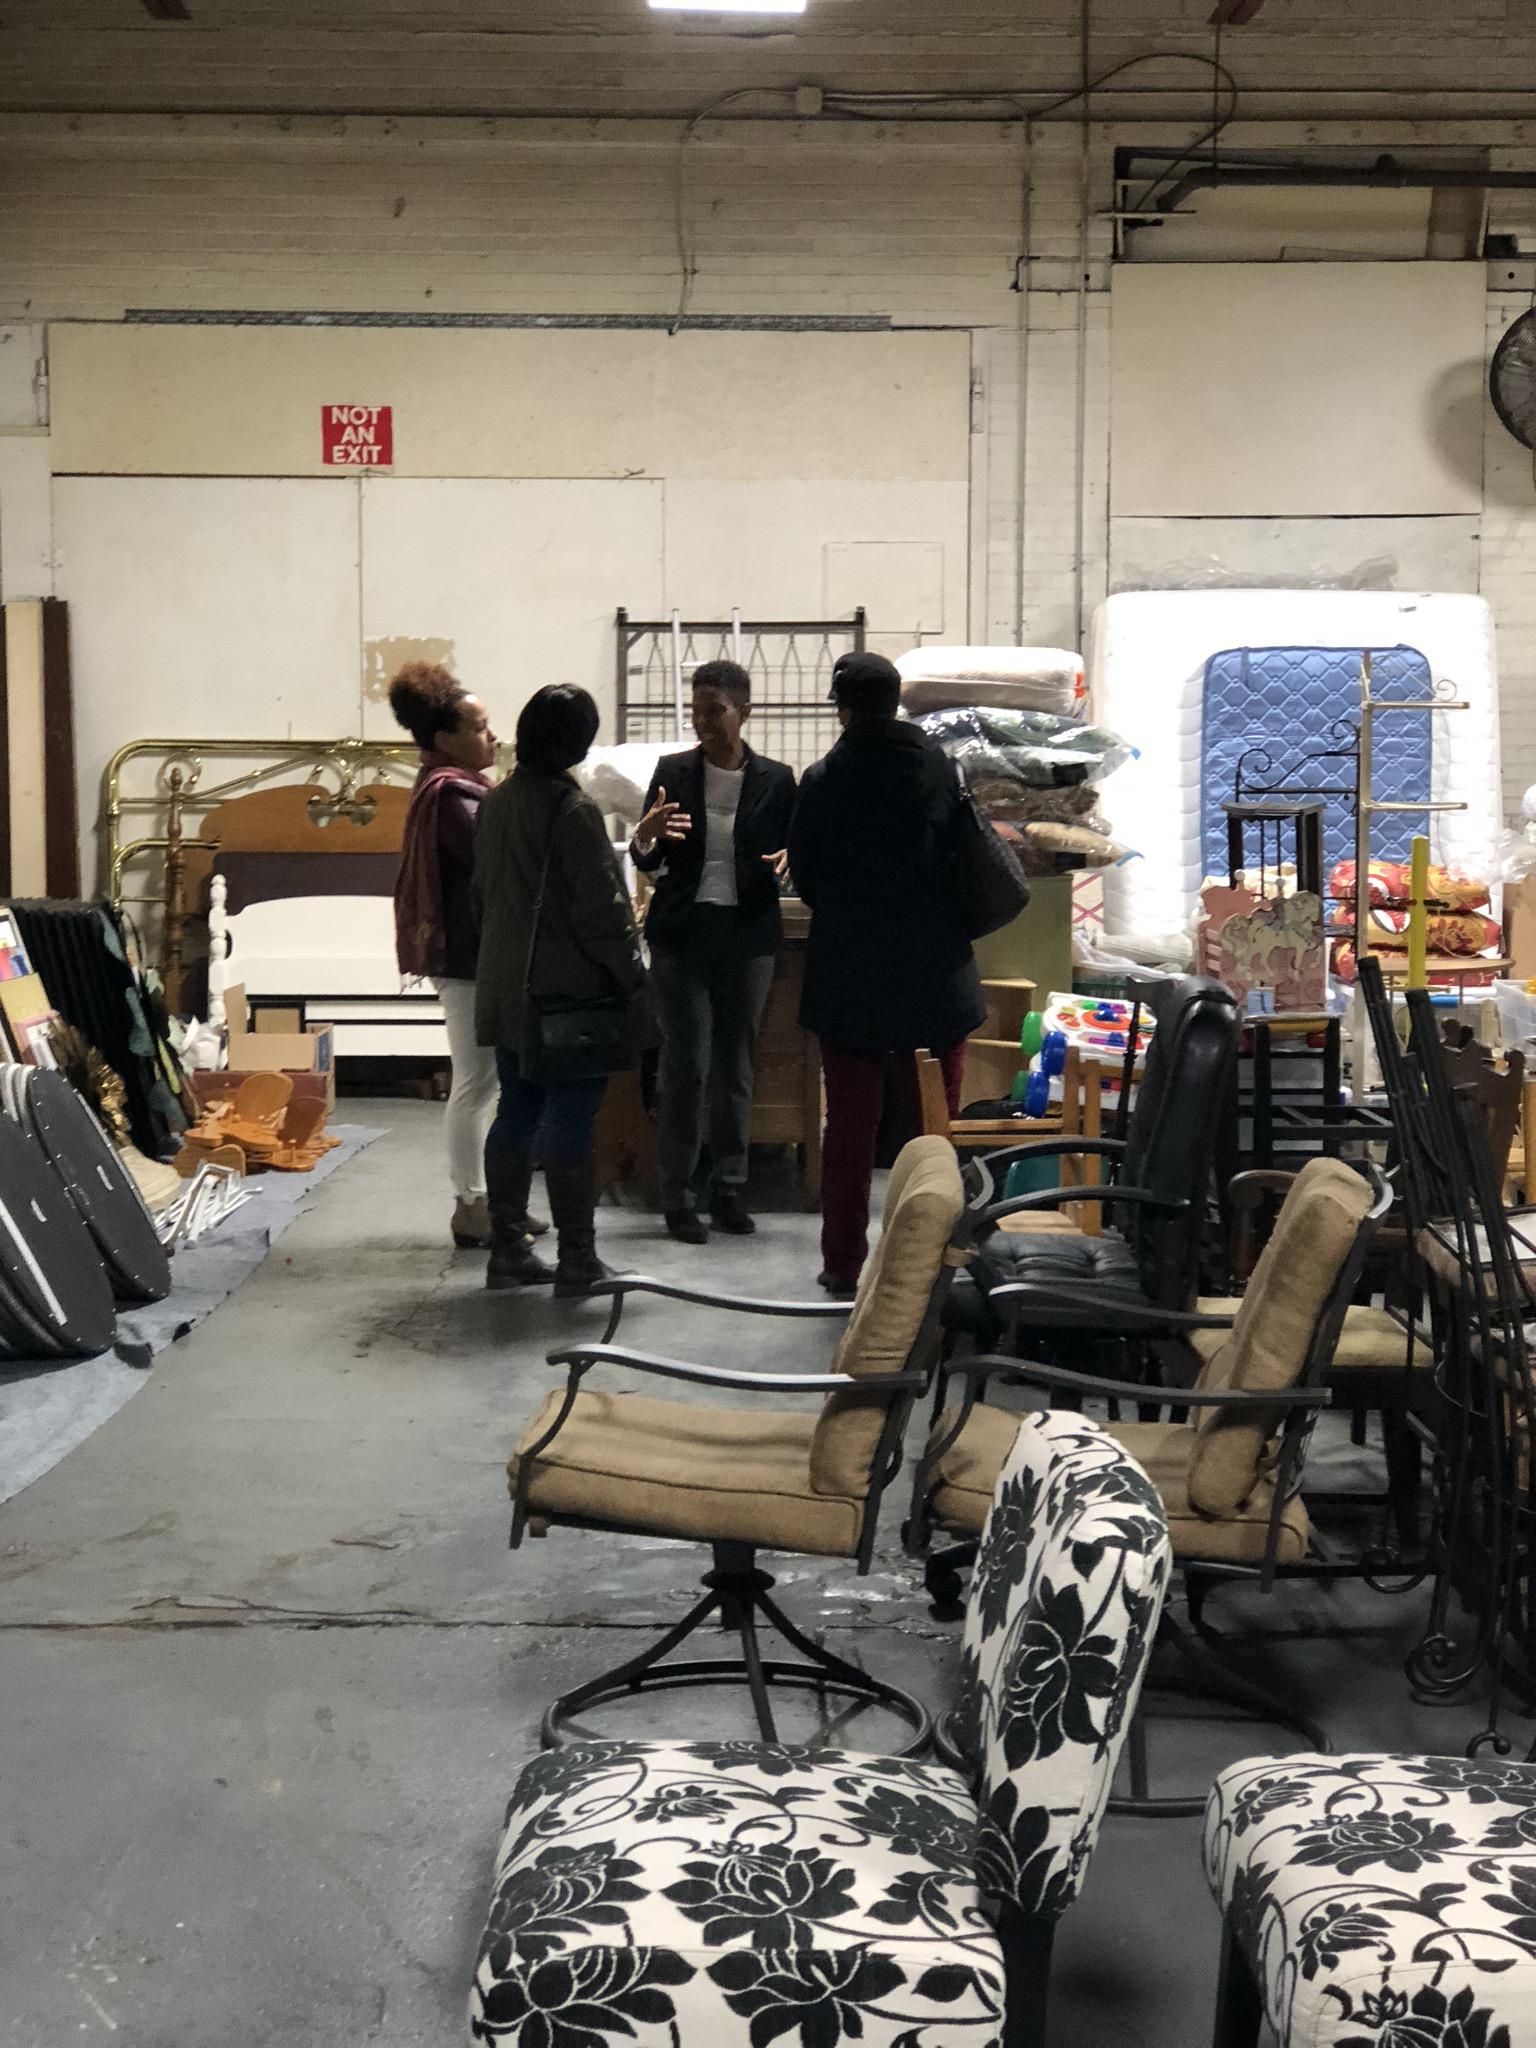 Attendees 12 warehouse view.JPEG